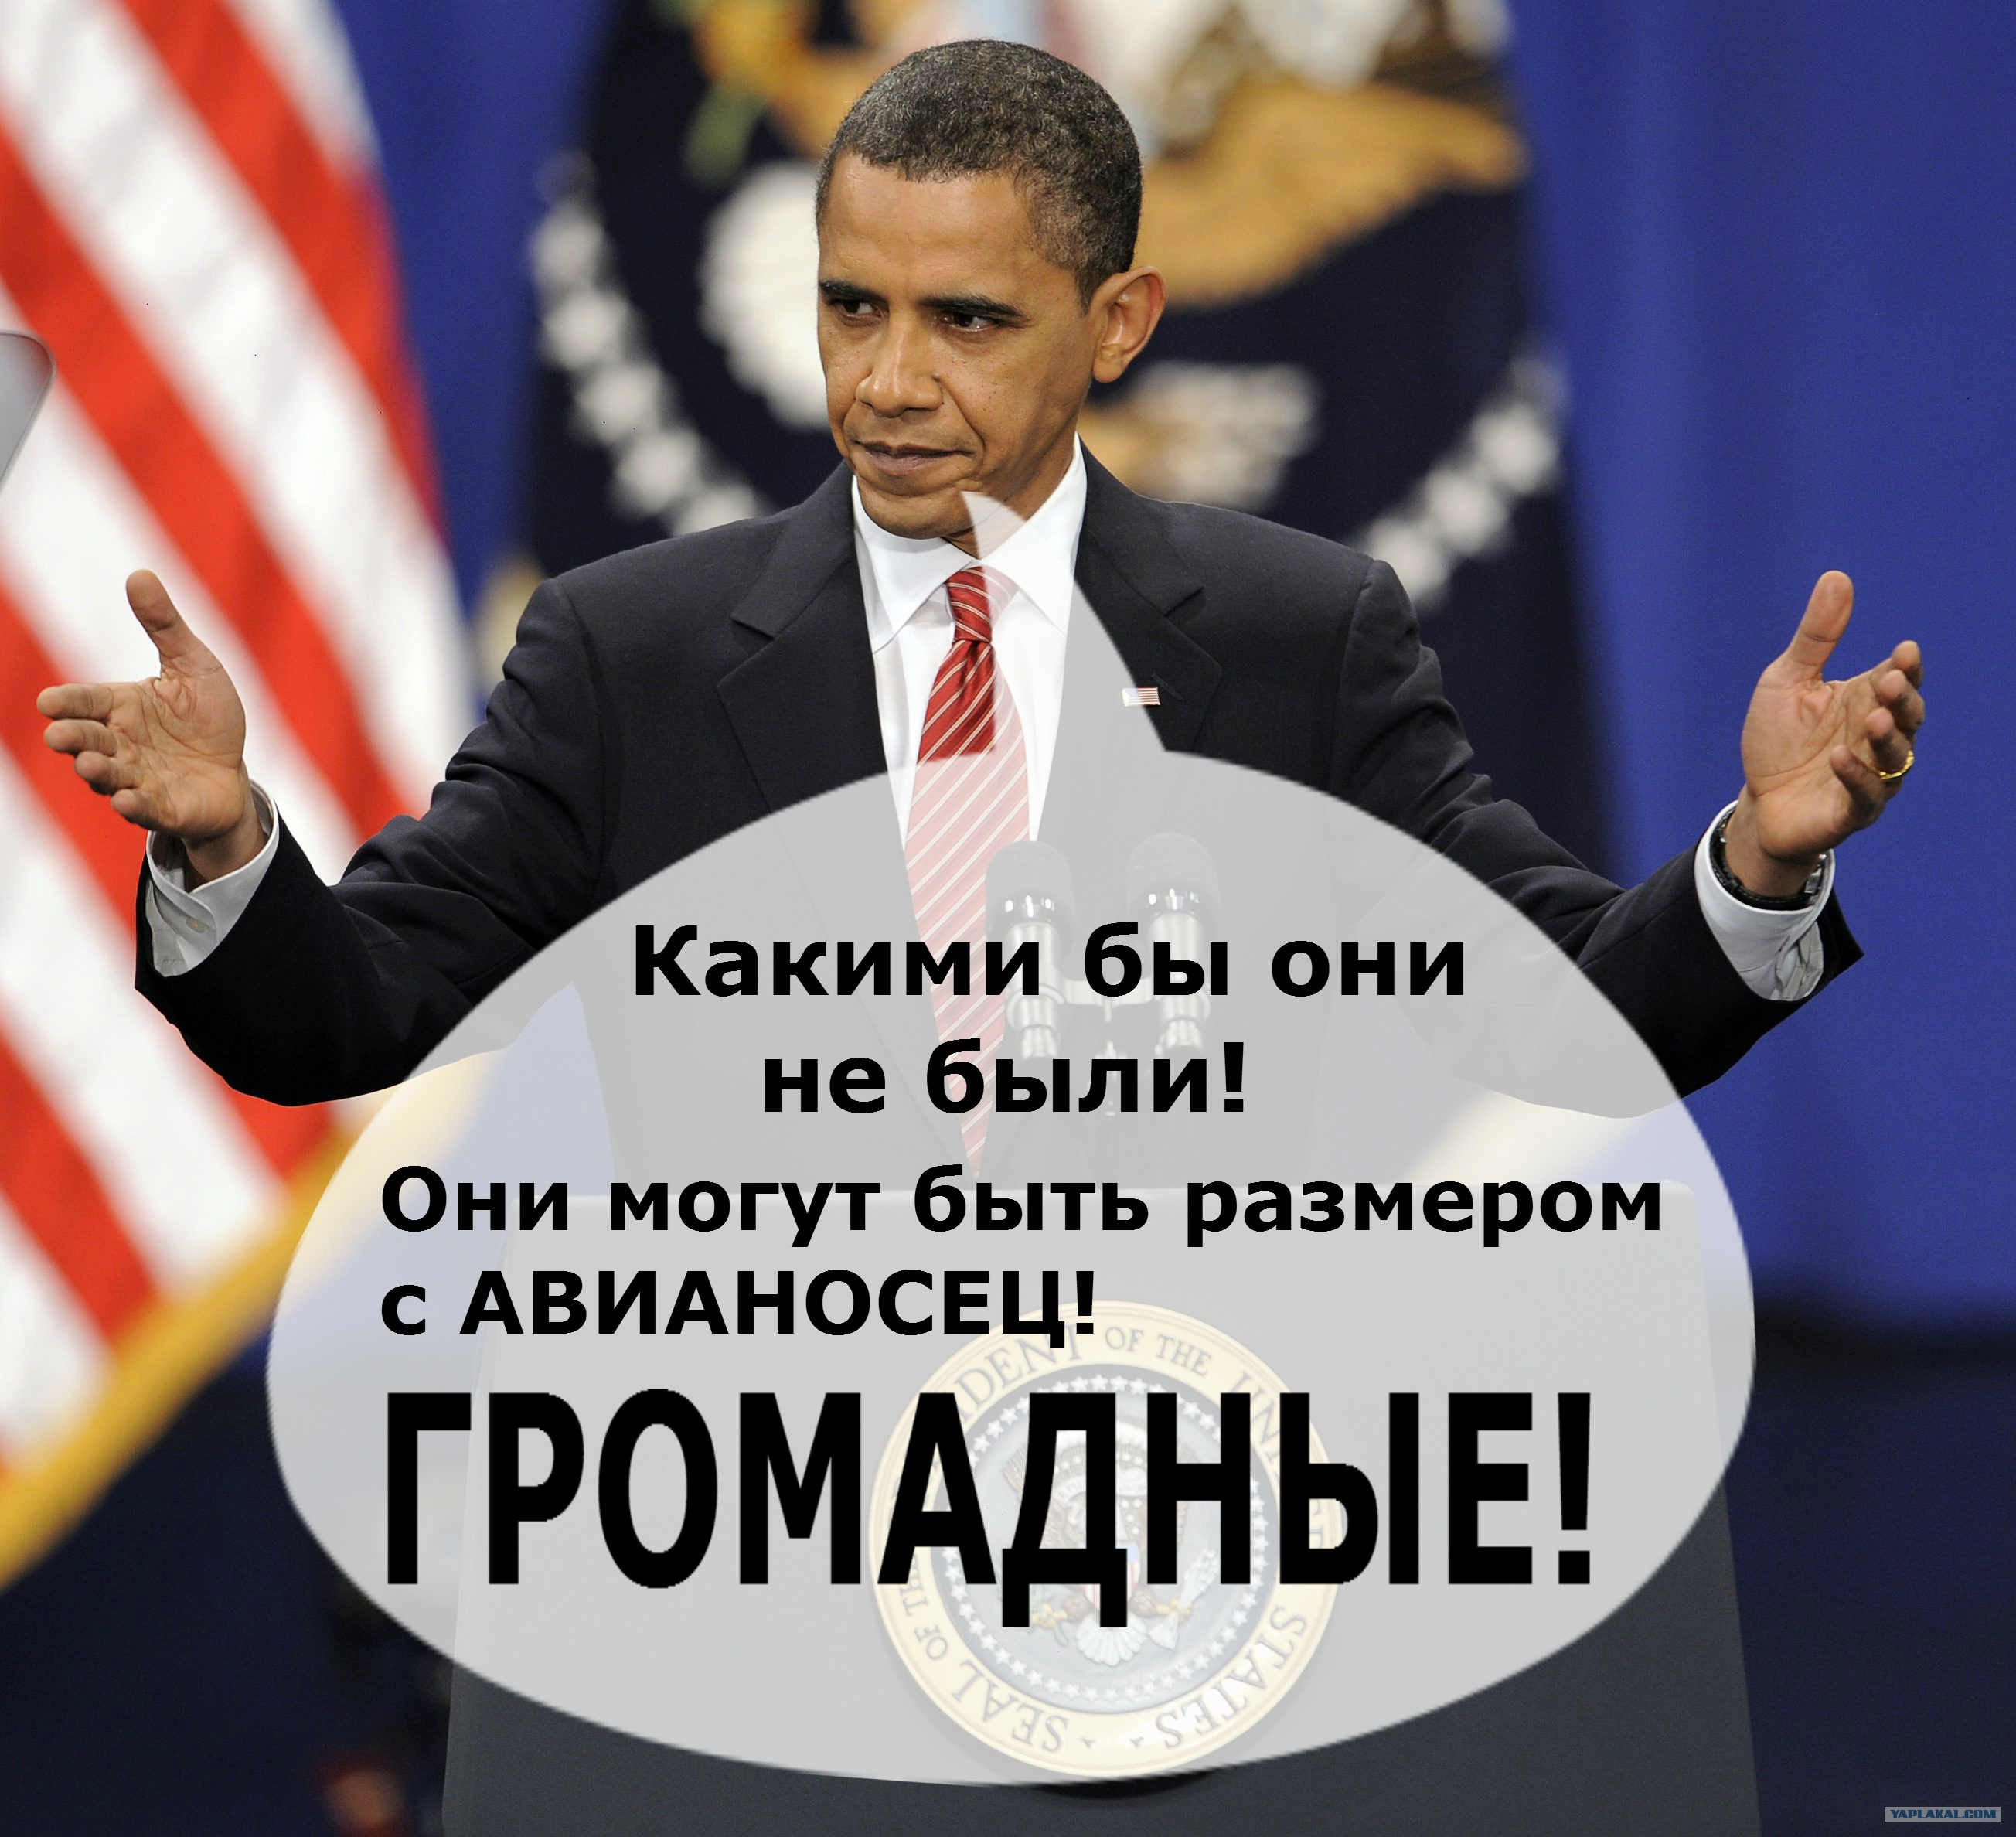 Obama's dissertation